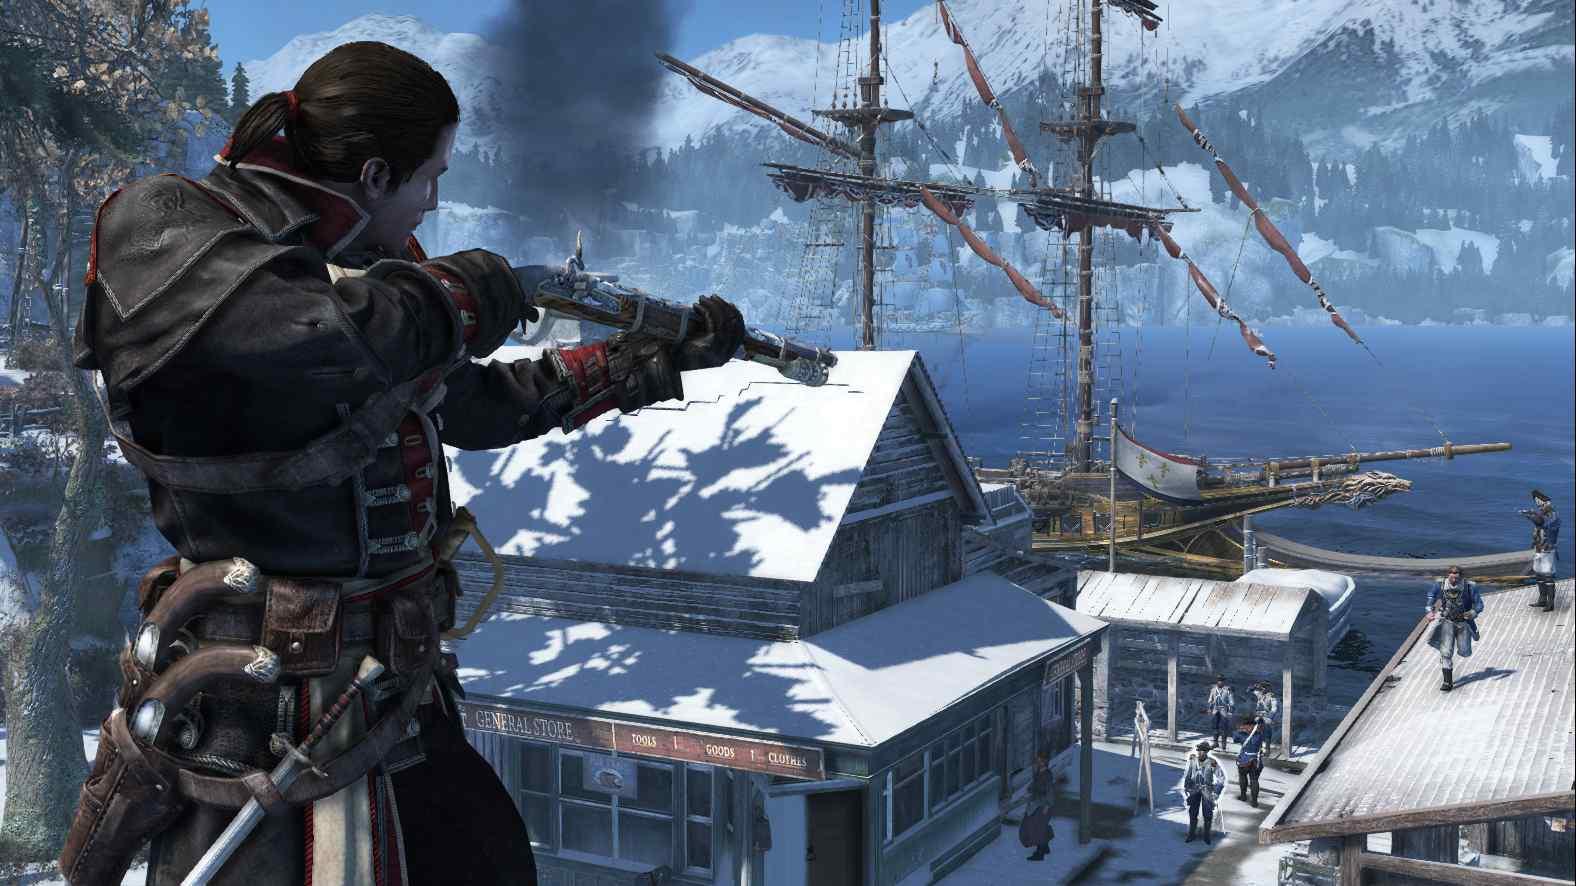 Assassin's Creed: Rogue Screenshot 3